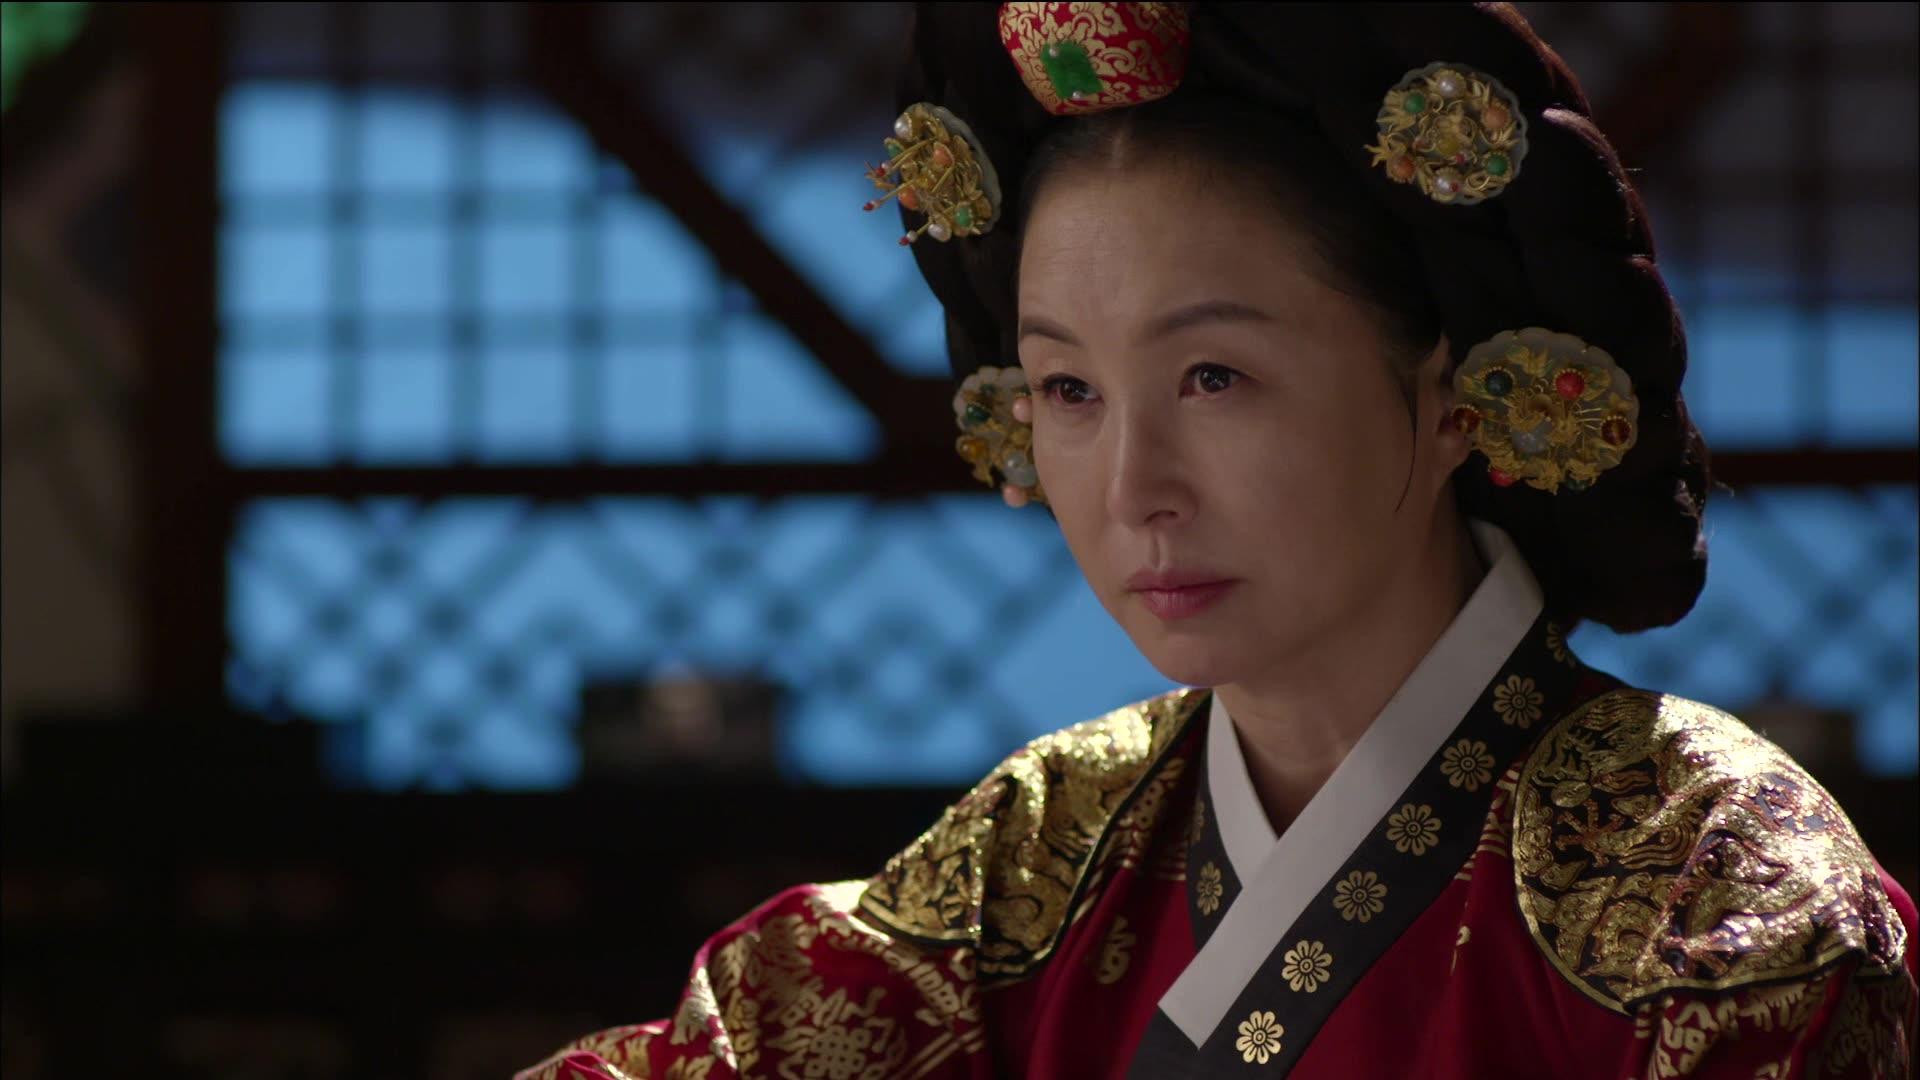 The Flower in Prison Episode 43 - 옥중화 - Watch Full Episodes Free - Korea - TV Shows - Rakuten Viki